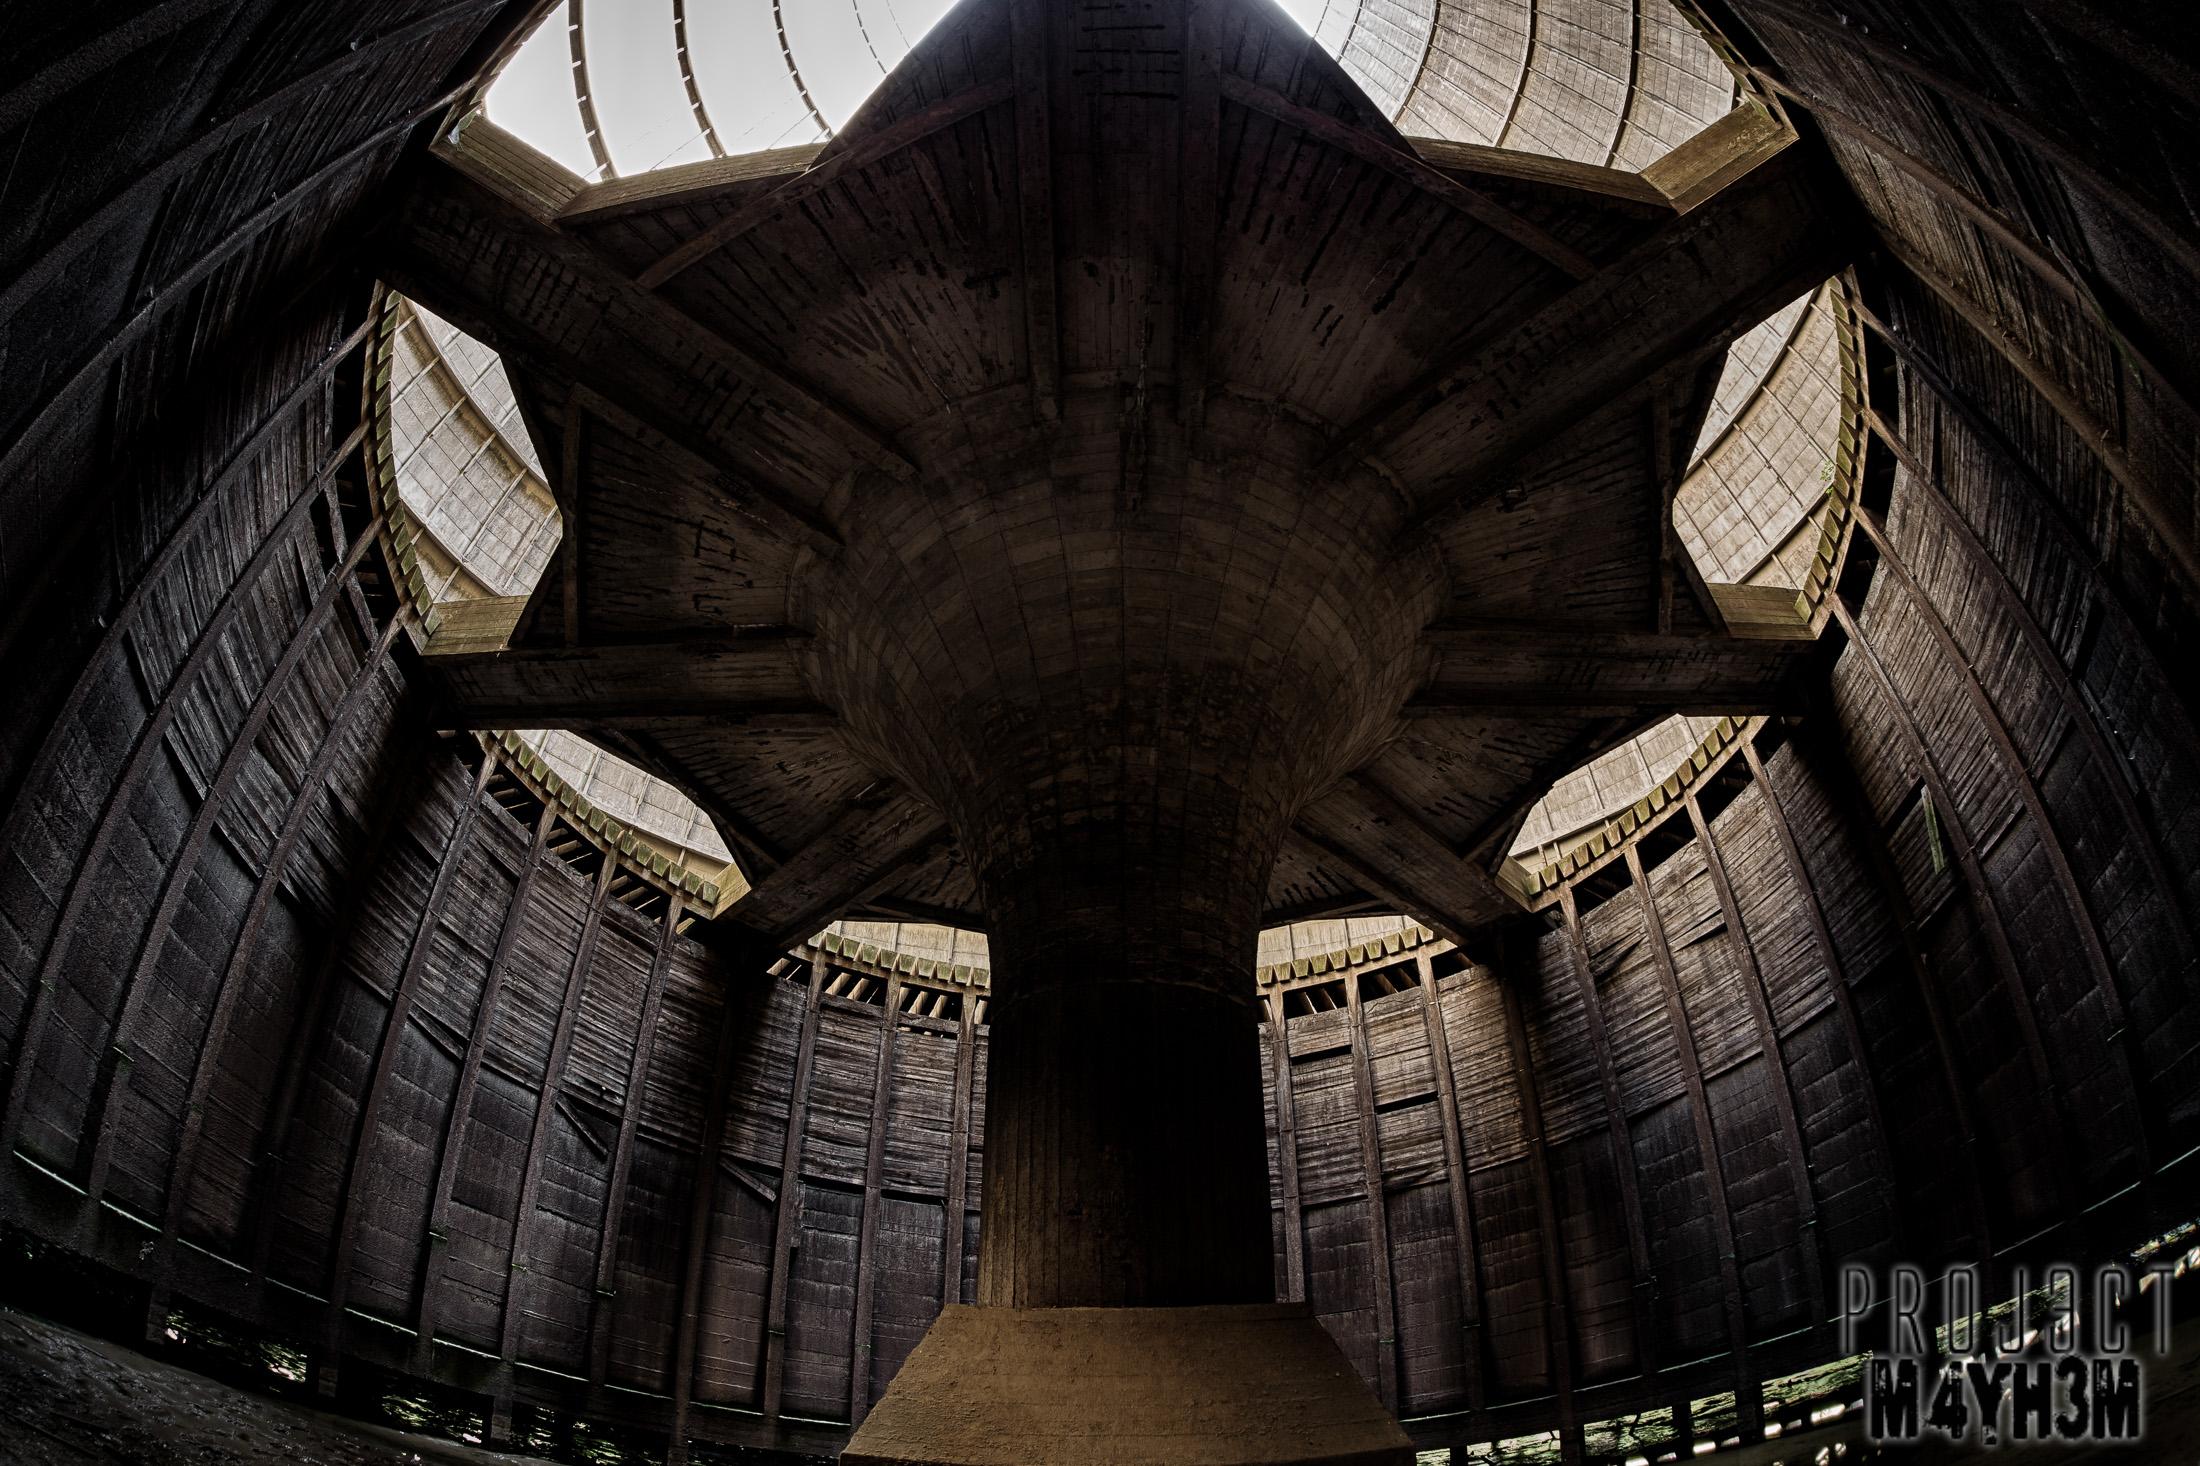 IM Power Station - The Spaceship